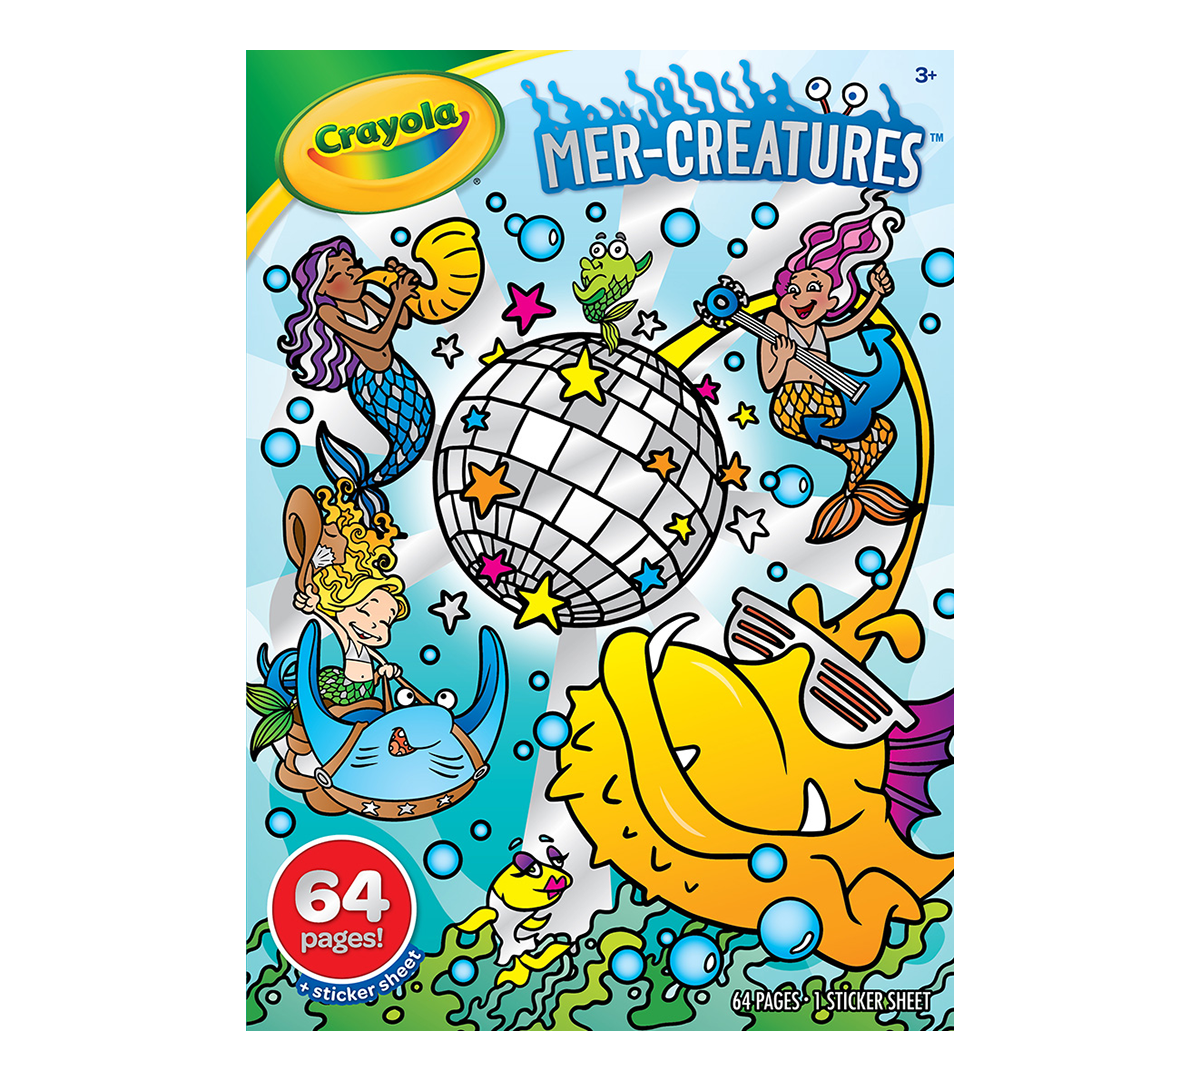 - Mer-Creatures Mermaid Coloring Book For Kids Crayola.com Crayola